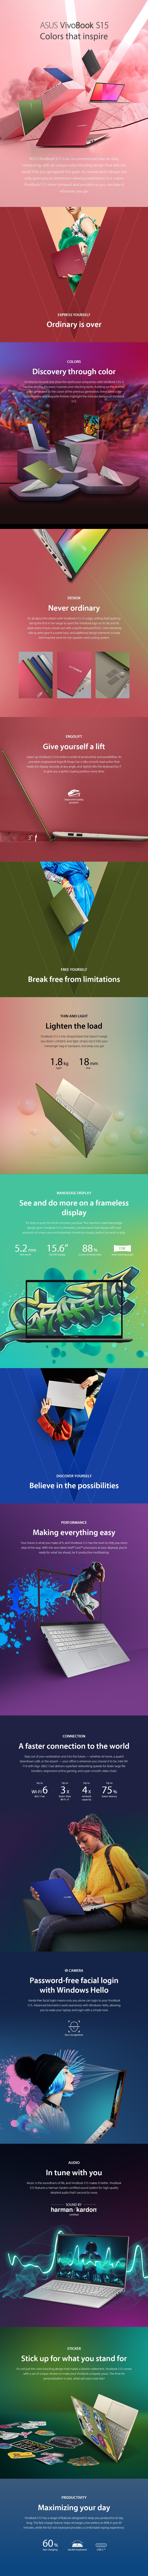 "ASUS VivoBook S15 S531FA 15.6"" Laptop i5-10210U 8GB 1TB W10H - Overview 1"